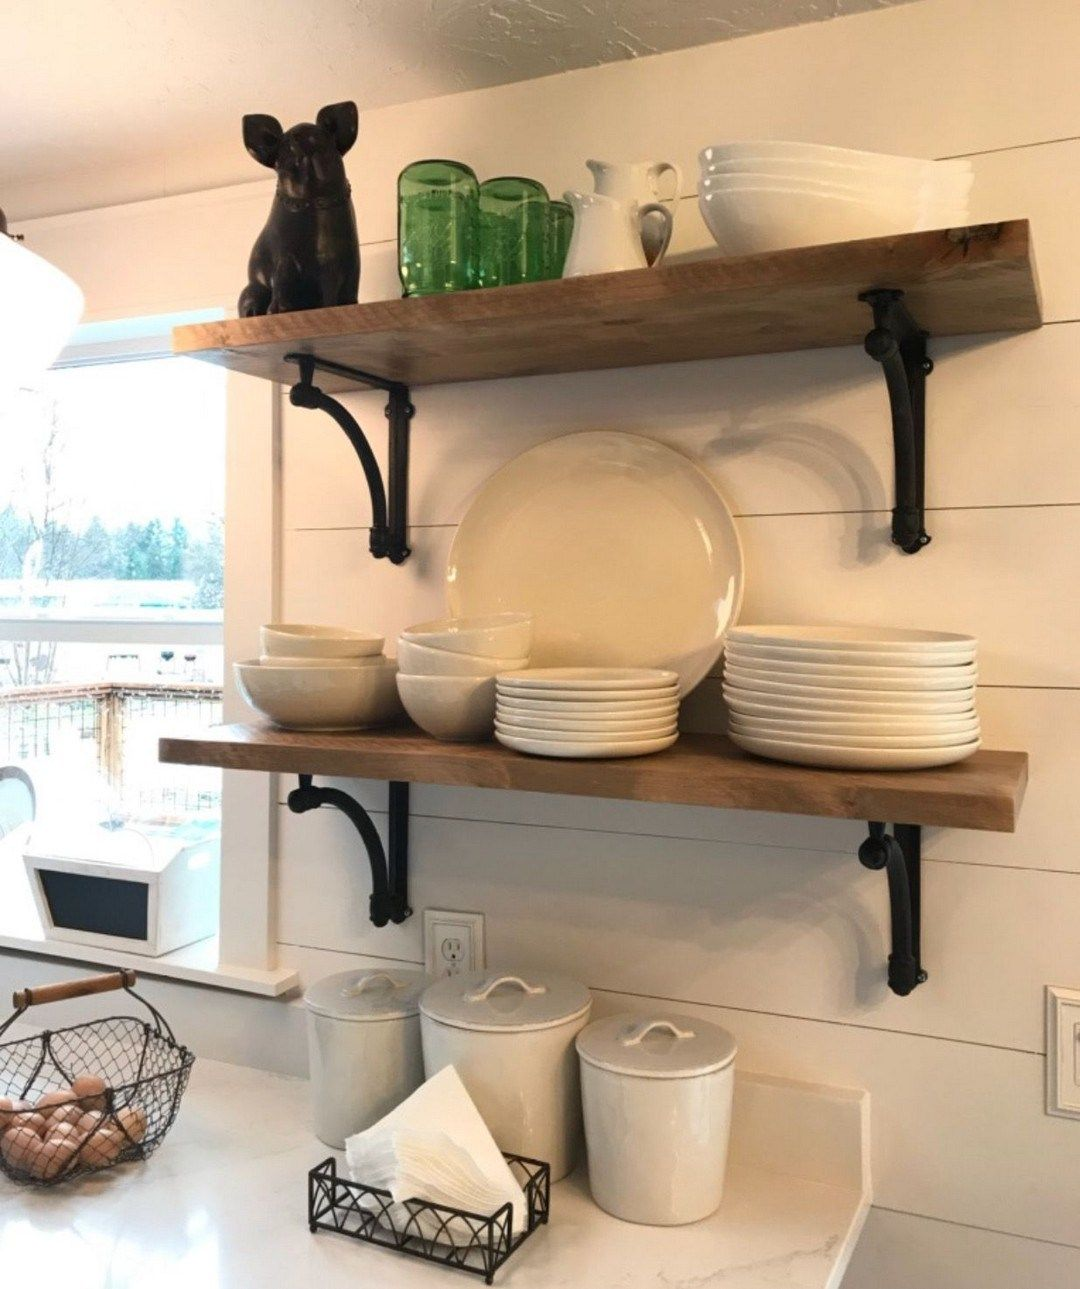 49 Cuisine Live Bord Flottant Etageres 38 Flottant Etageres Sont Incroyablement Pratique Da Floating Shelves Kitchen Floating Shelves Wood Floating Shelves